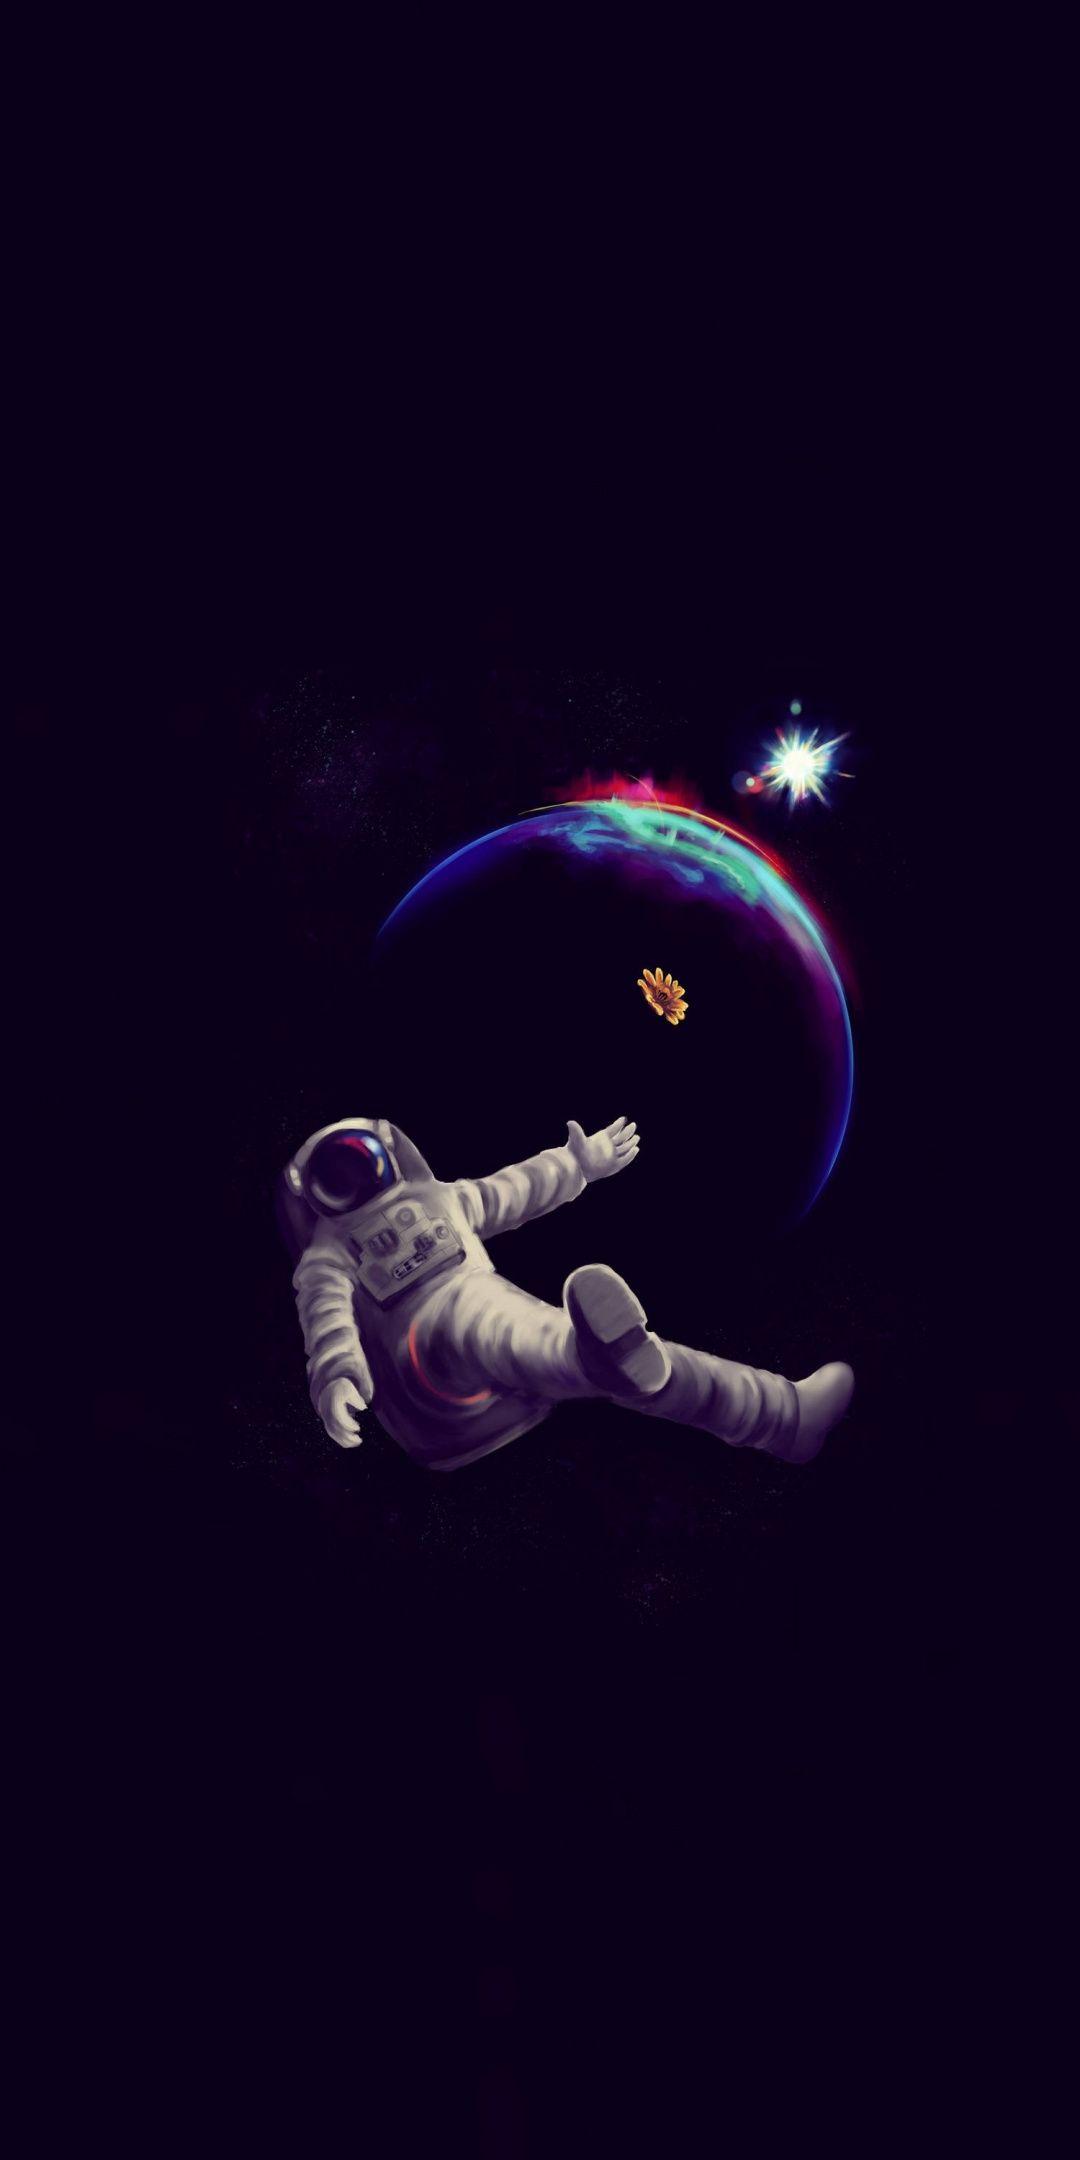 astronaut, dark, minimal, 1080x2160 wallpaper